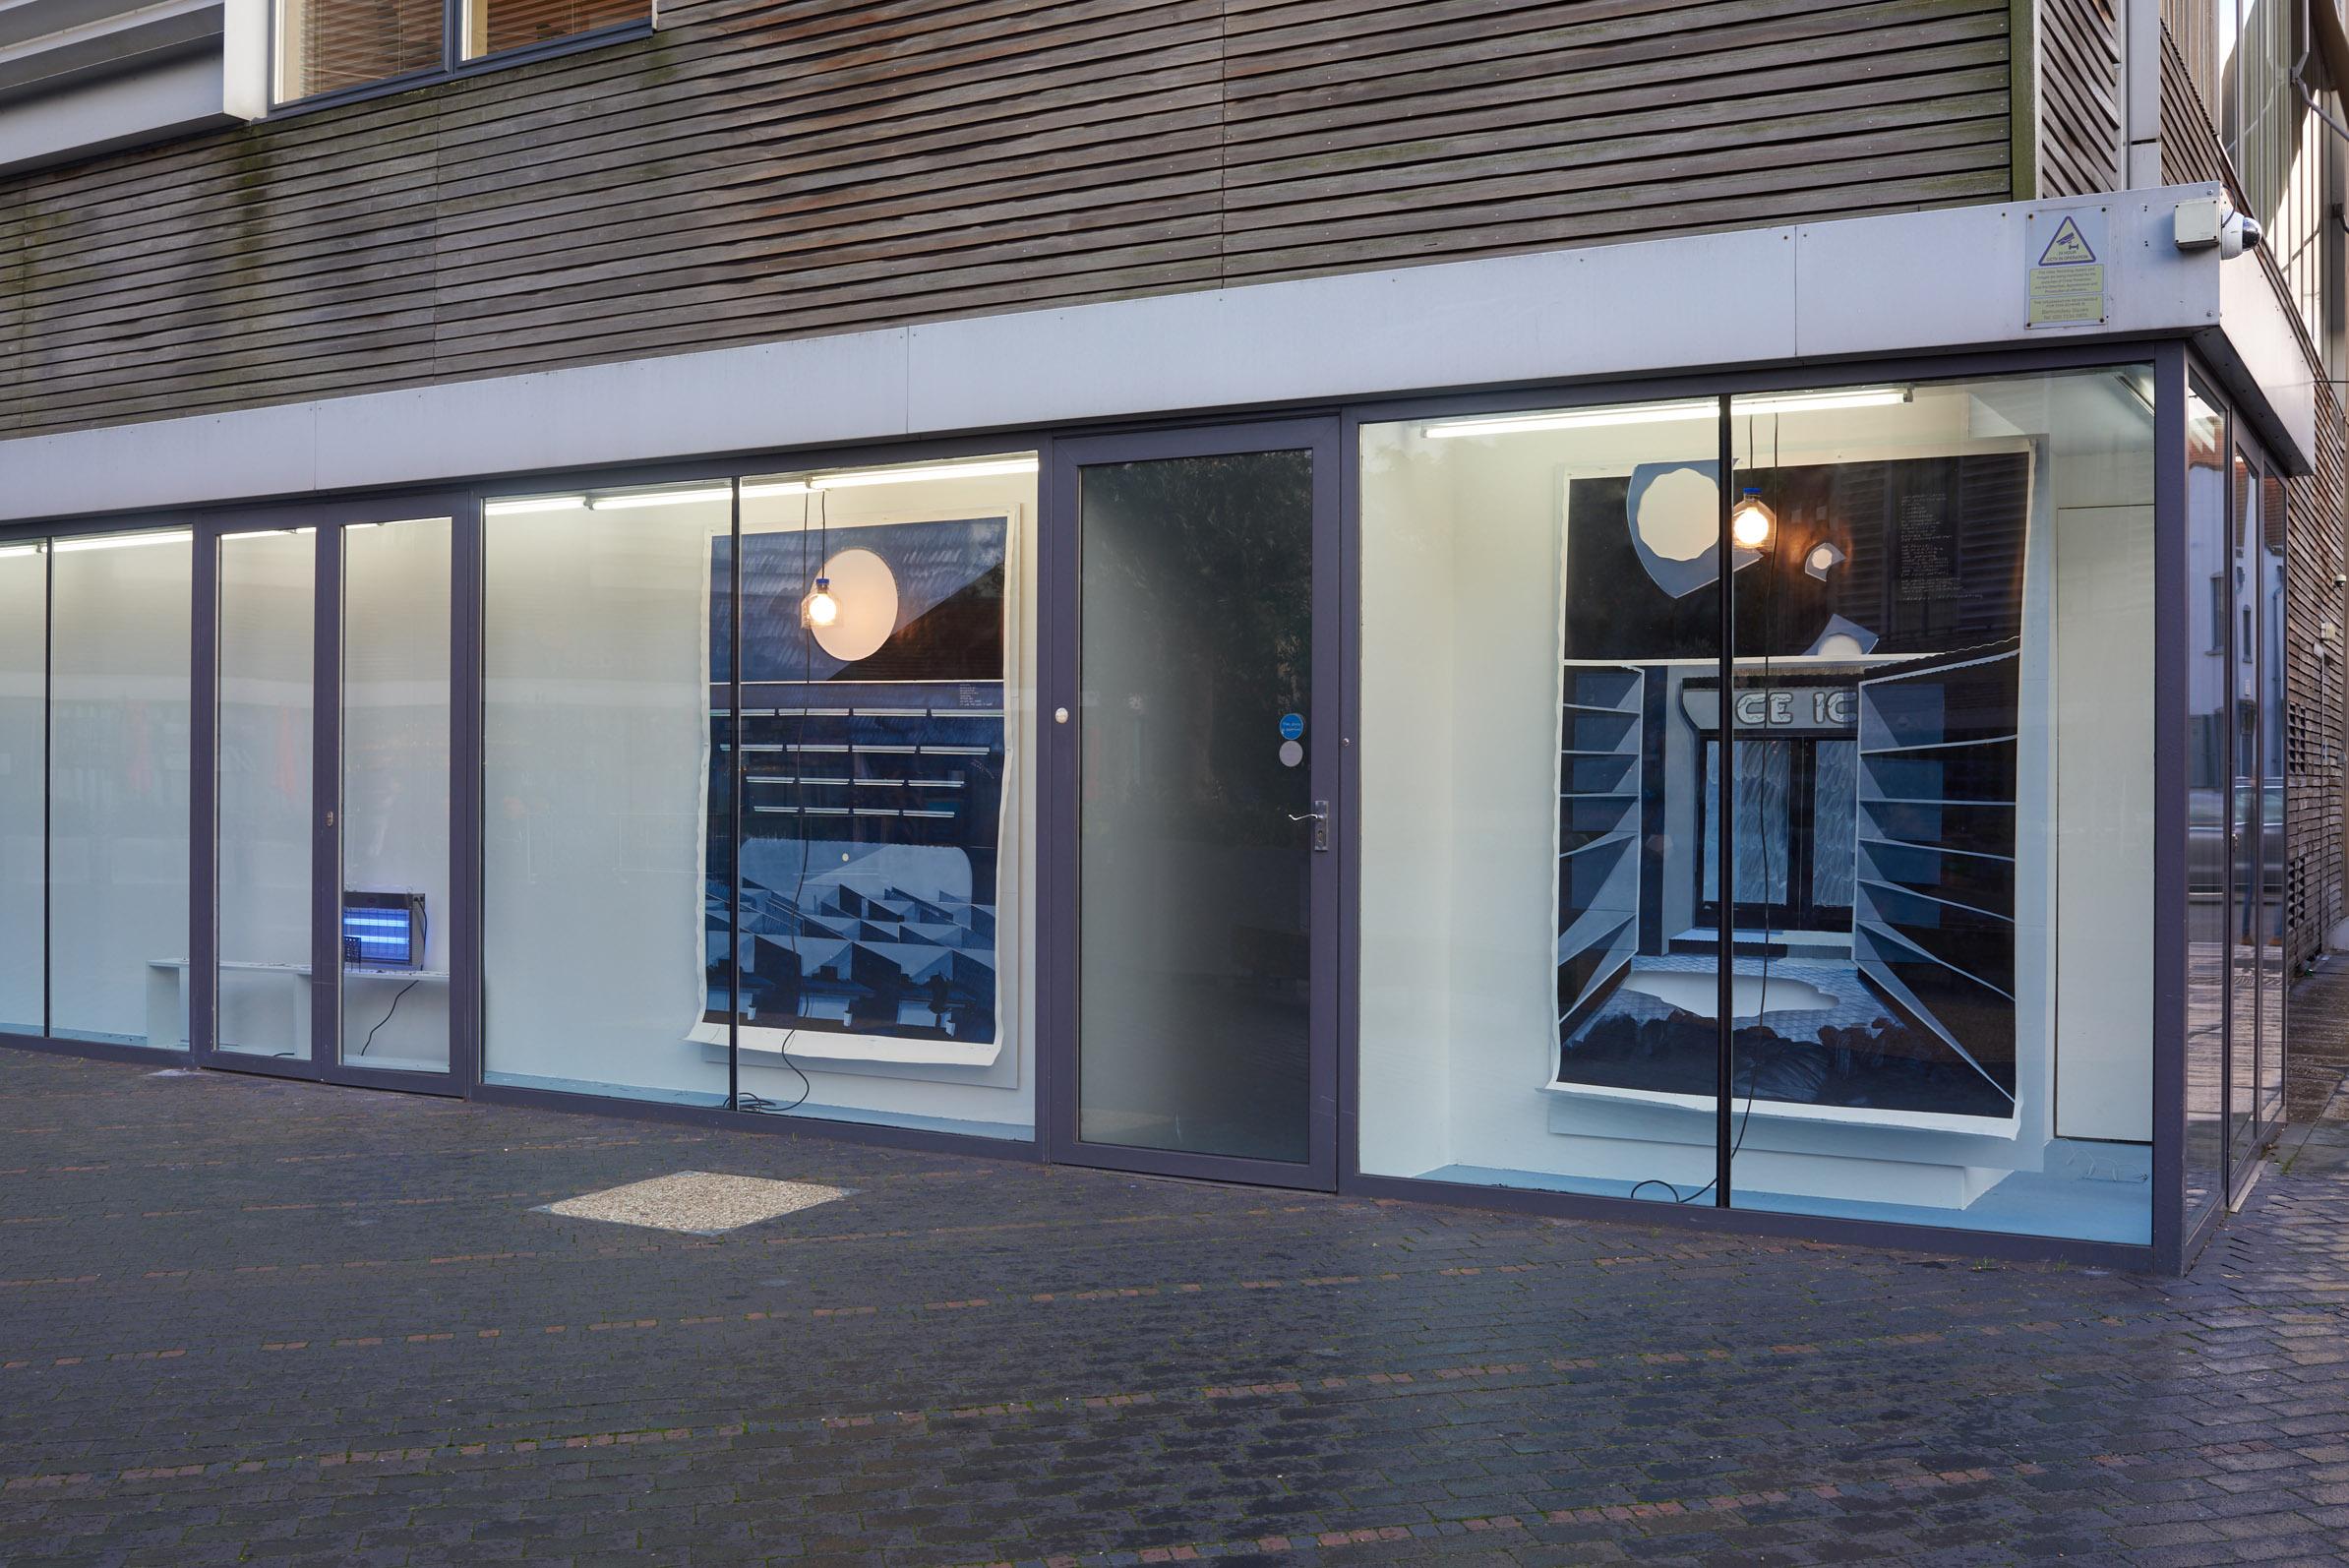 Charlie Godet Thomas, NON-STOP-SUPER-DE-LUX, 2019. Installation view. VITRINE, London. Photographer Jonathon Bassett.